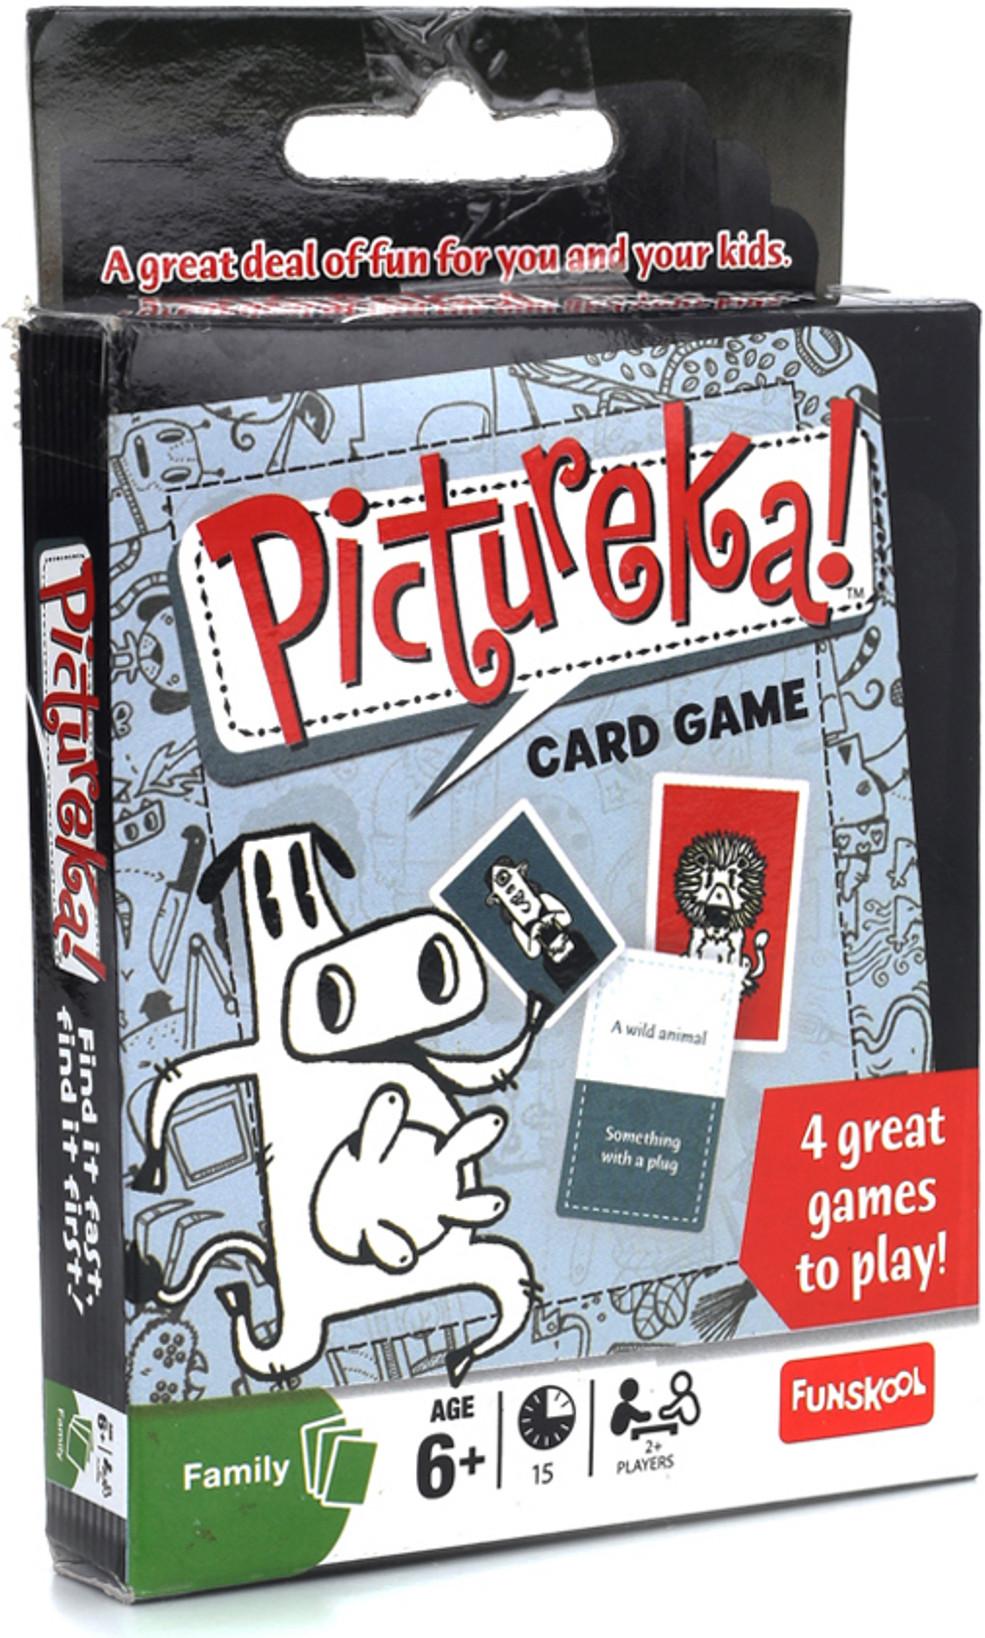 Funskool Pictureka Card Game Pictureka Card Game Shop